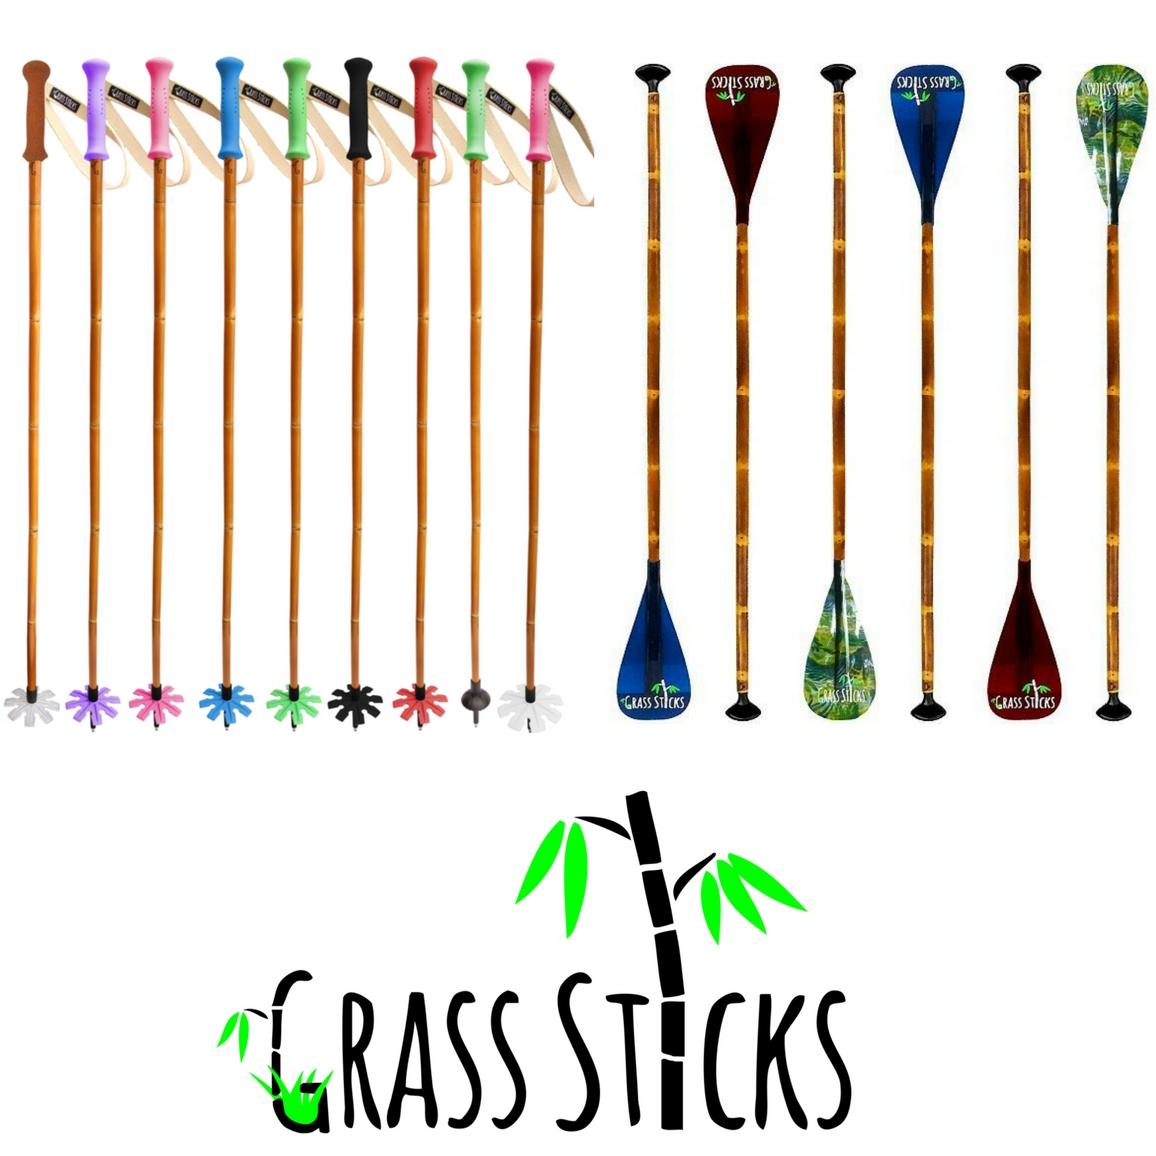 Grass Sticks Brand image (1).jpg